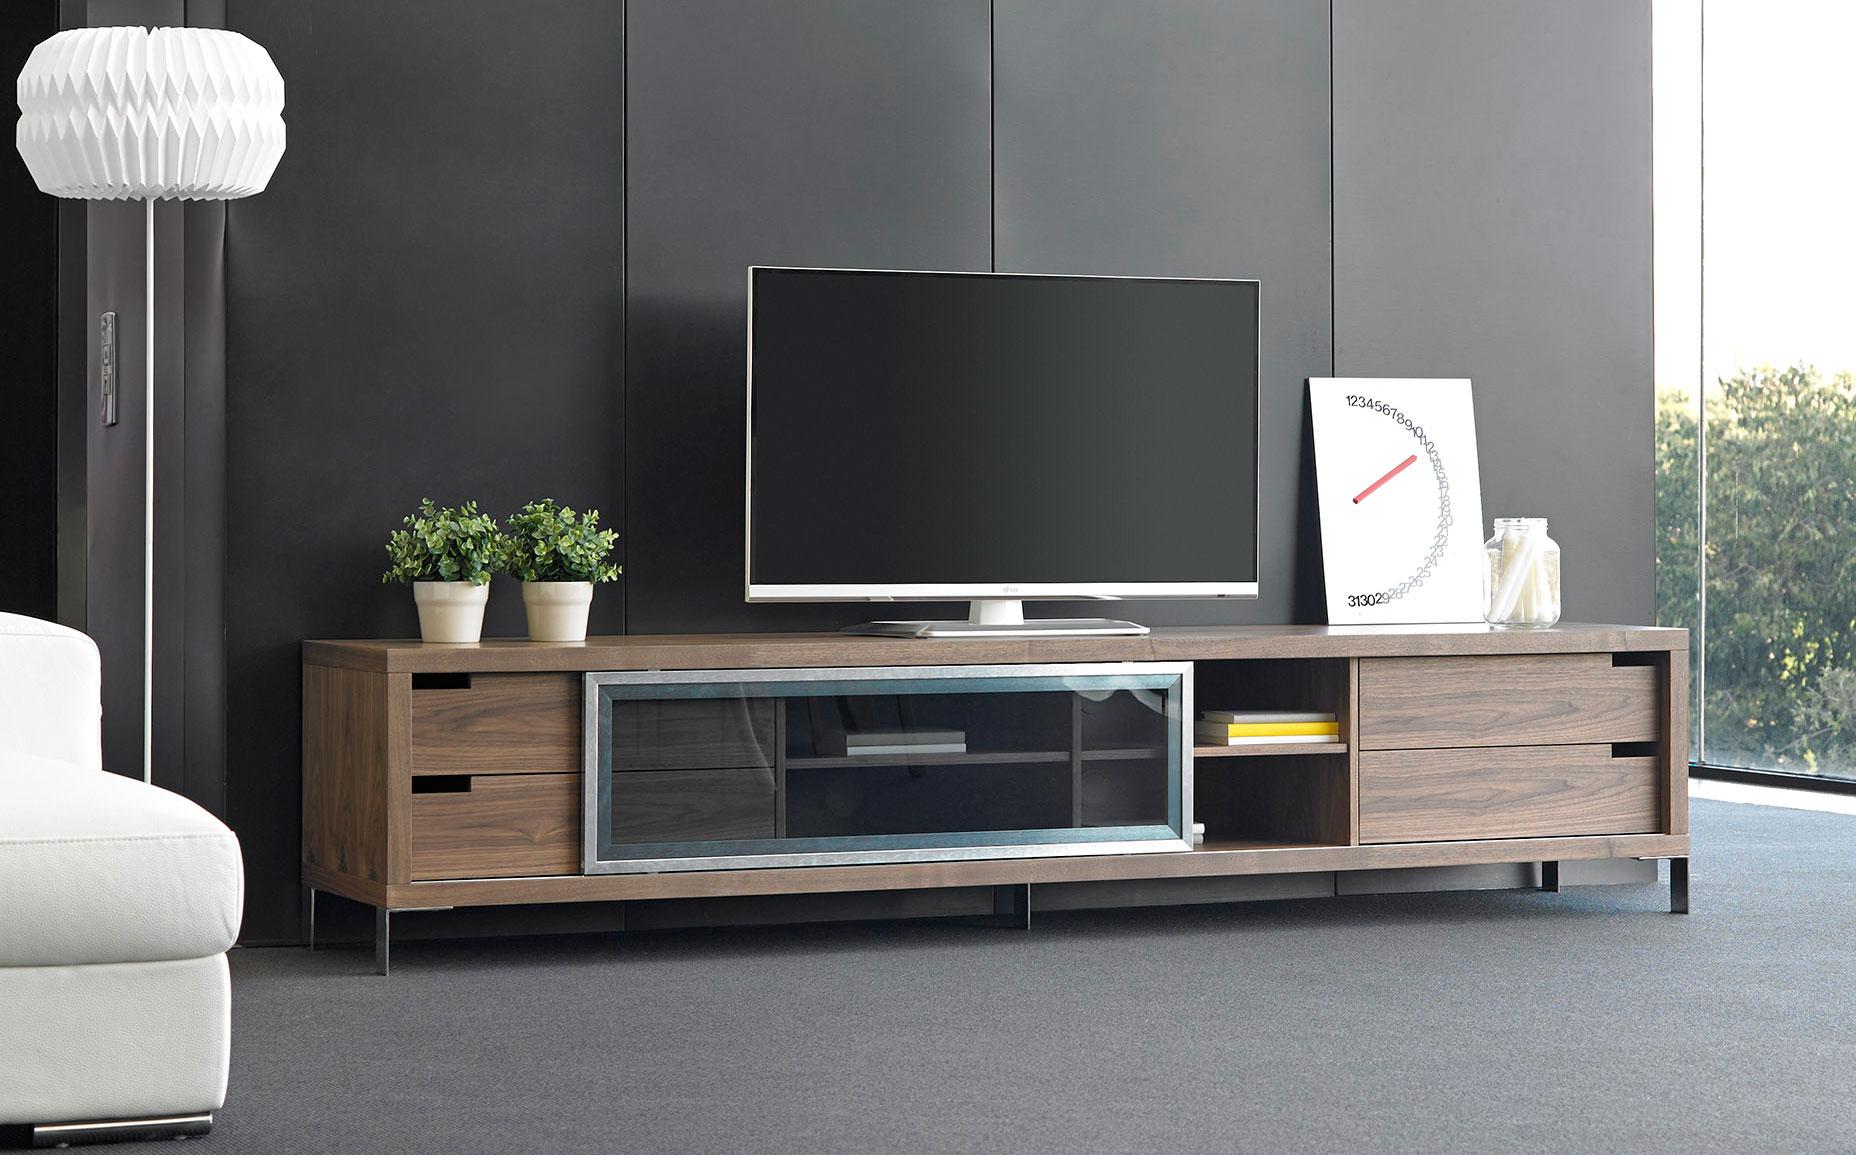 muebles roberto velez malaga obtenga ideas dise o de ForMuebles Velez Malaga